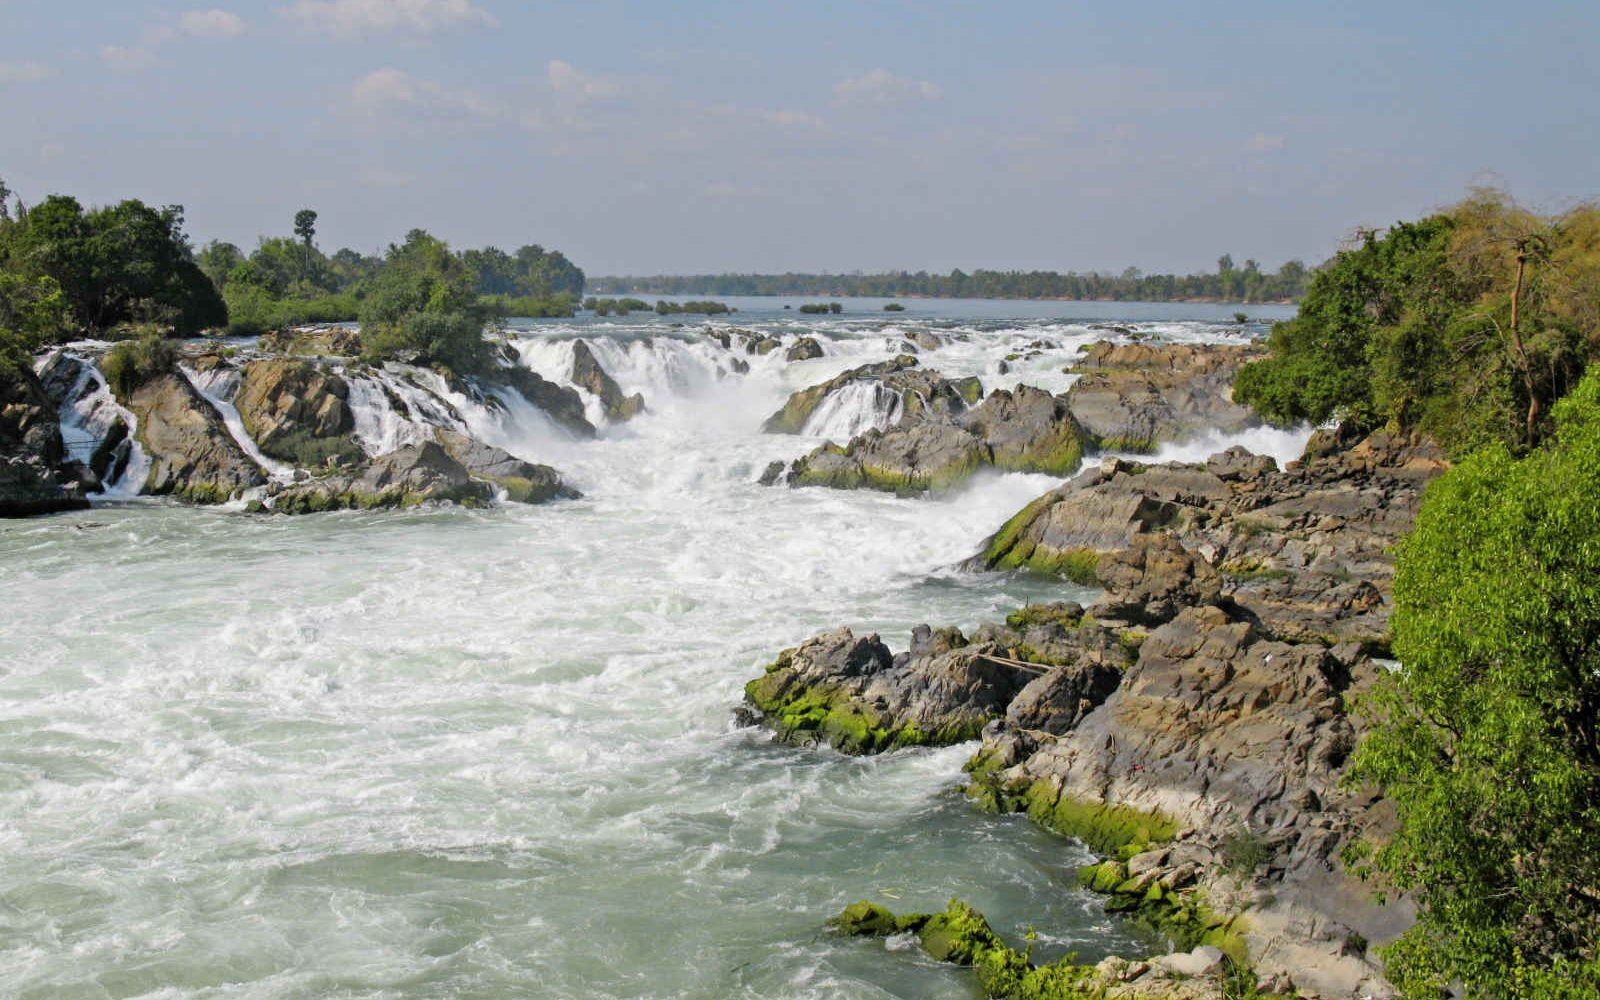 Chutes d'eau, Laos